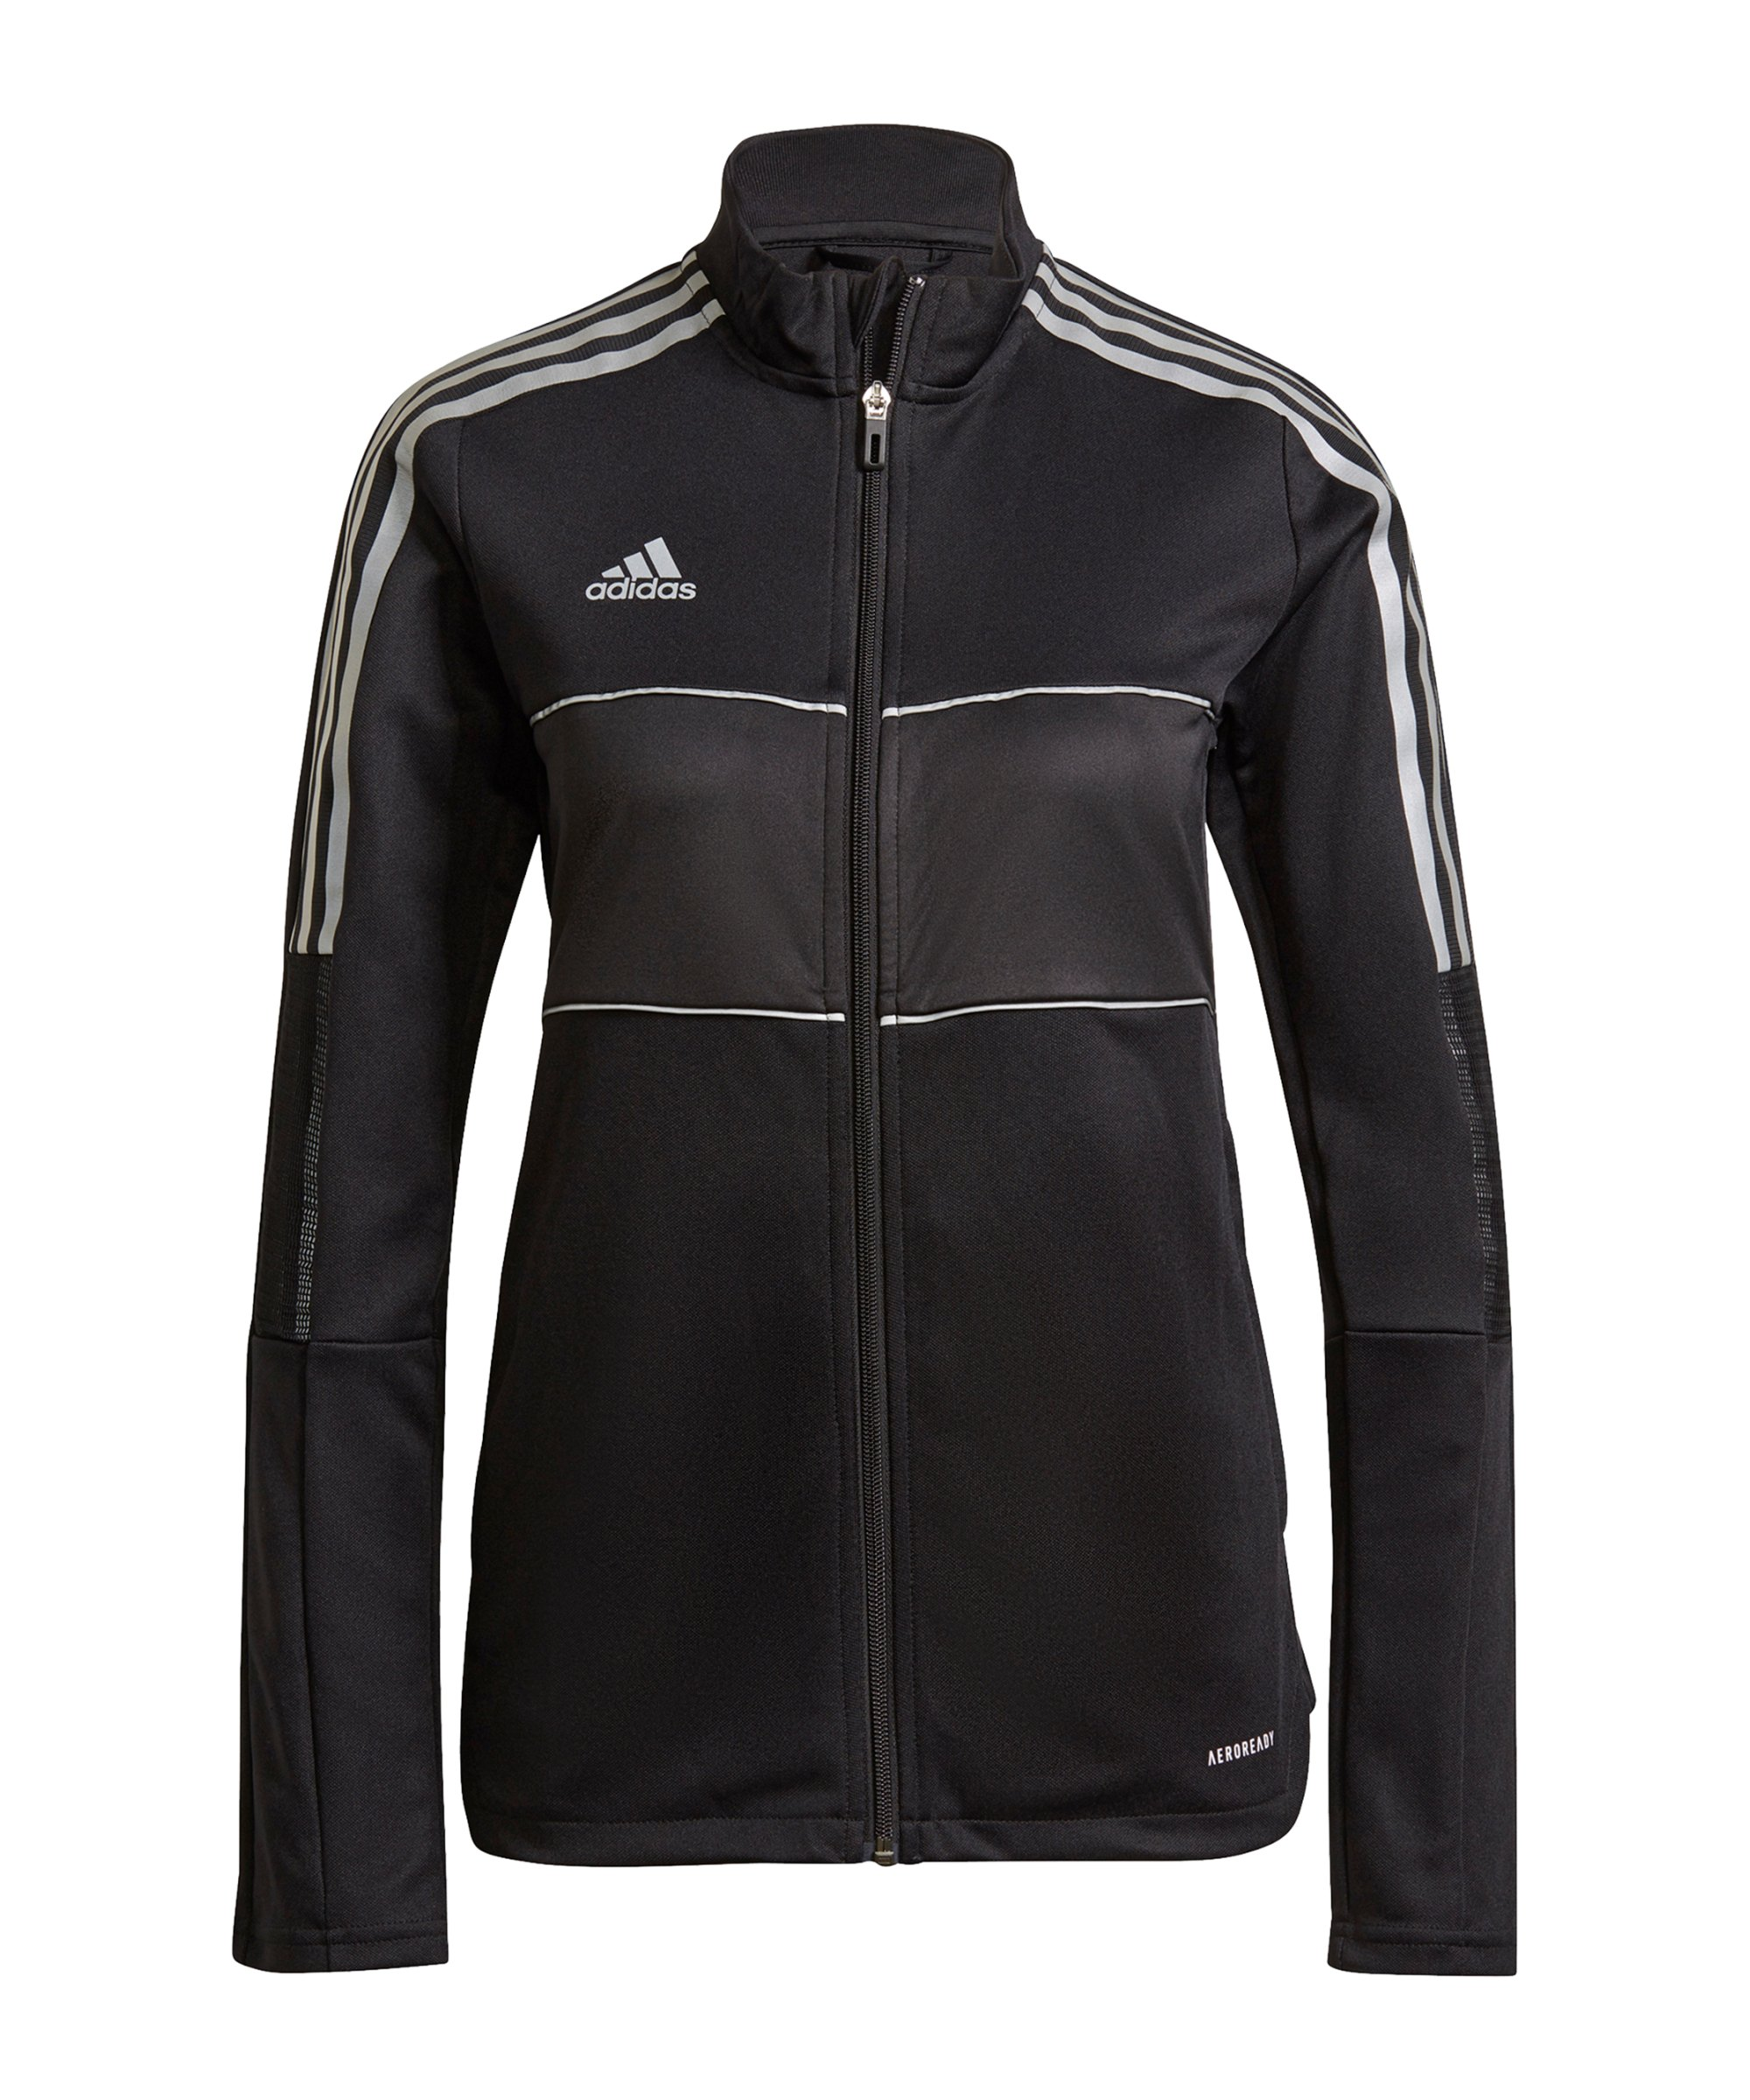 adidas House of Tiro Ref. Jacke Damen Schwarz - schwarz